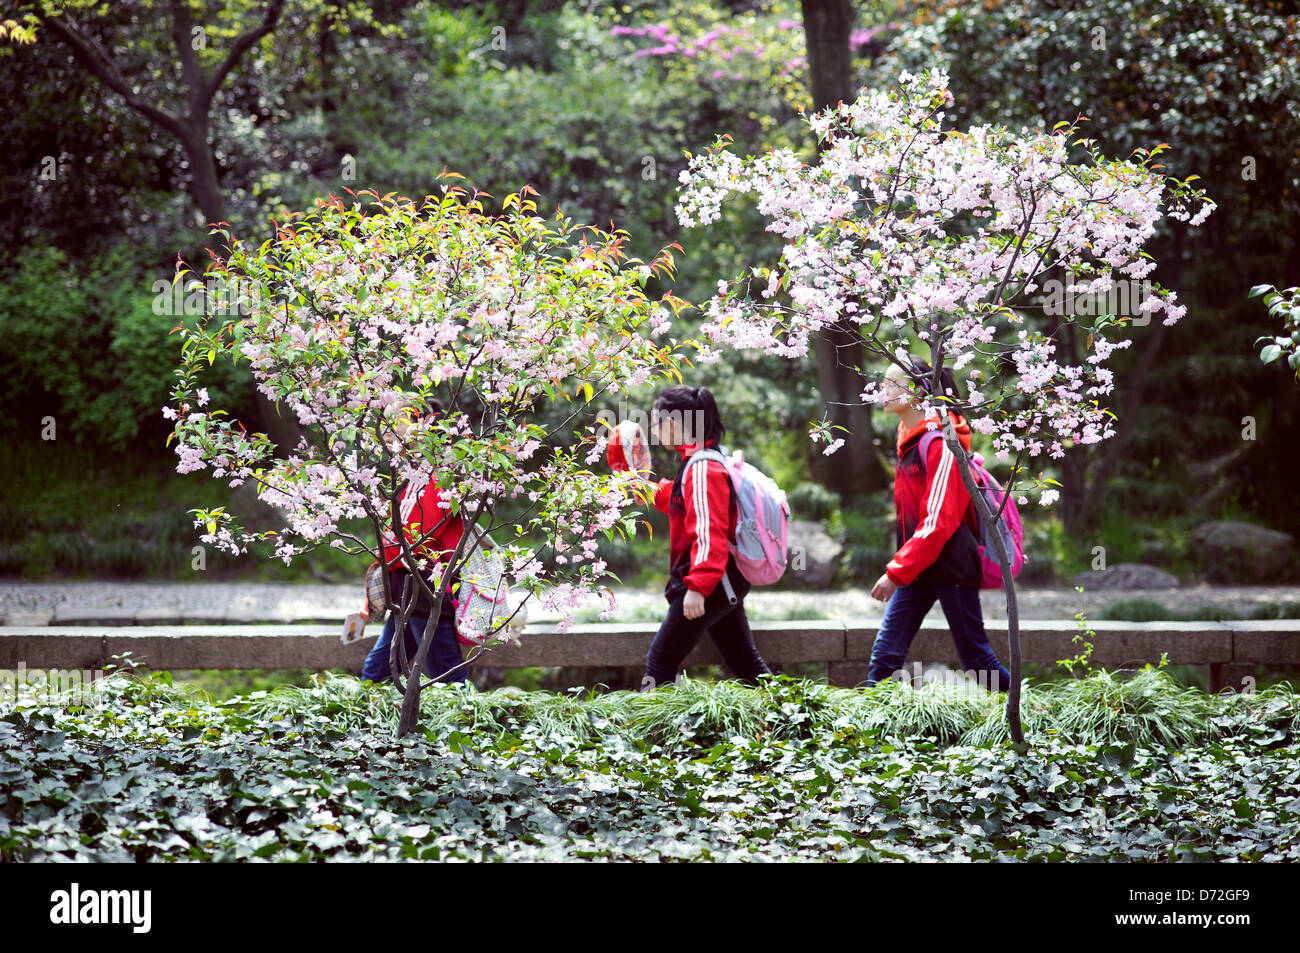 School children visiting the Humble Administrator's Garden, Suzhou, China - Stock Image